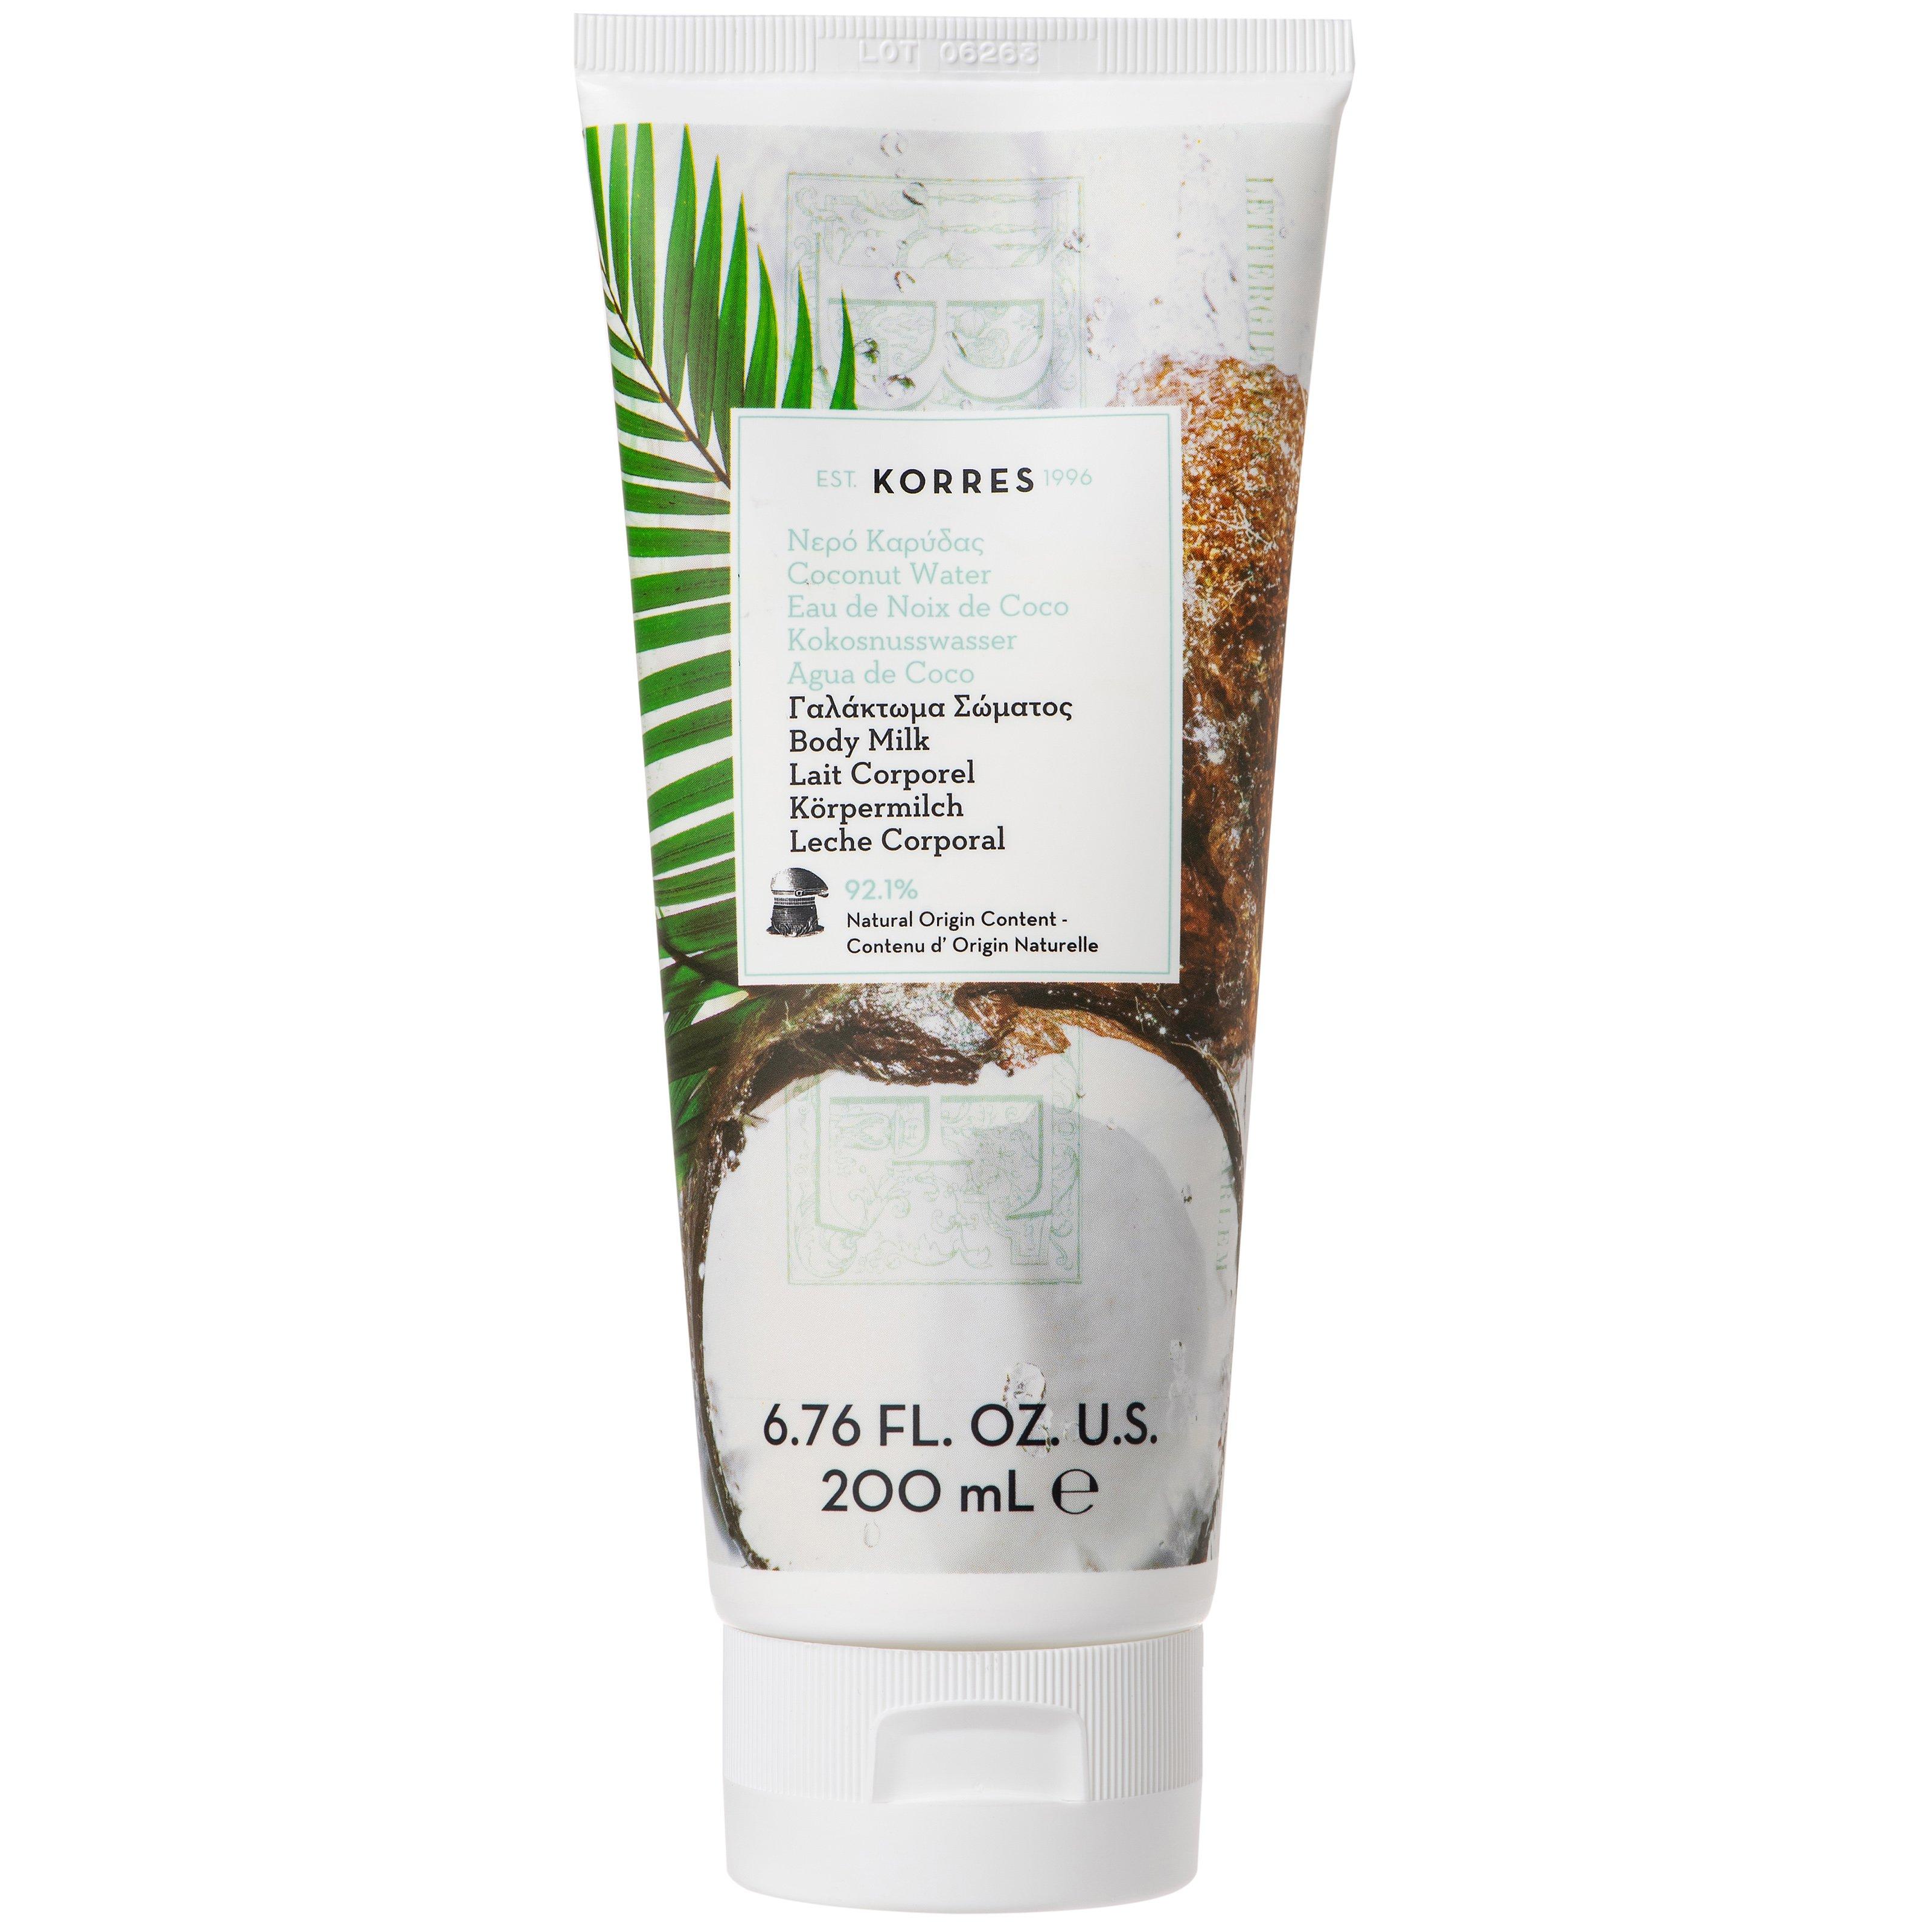 Korres Coconut Water Body Milk Ενυδατικό Γαλάκτωμα Σώματος με Απολαυστικό Άρωμα Καρύδας 200ml